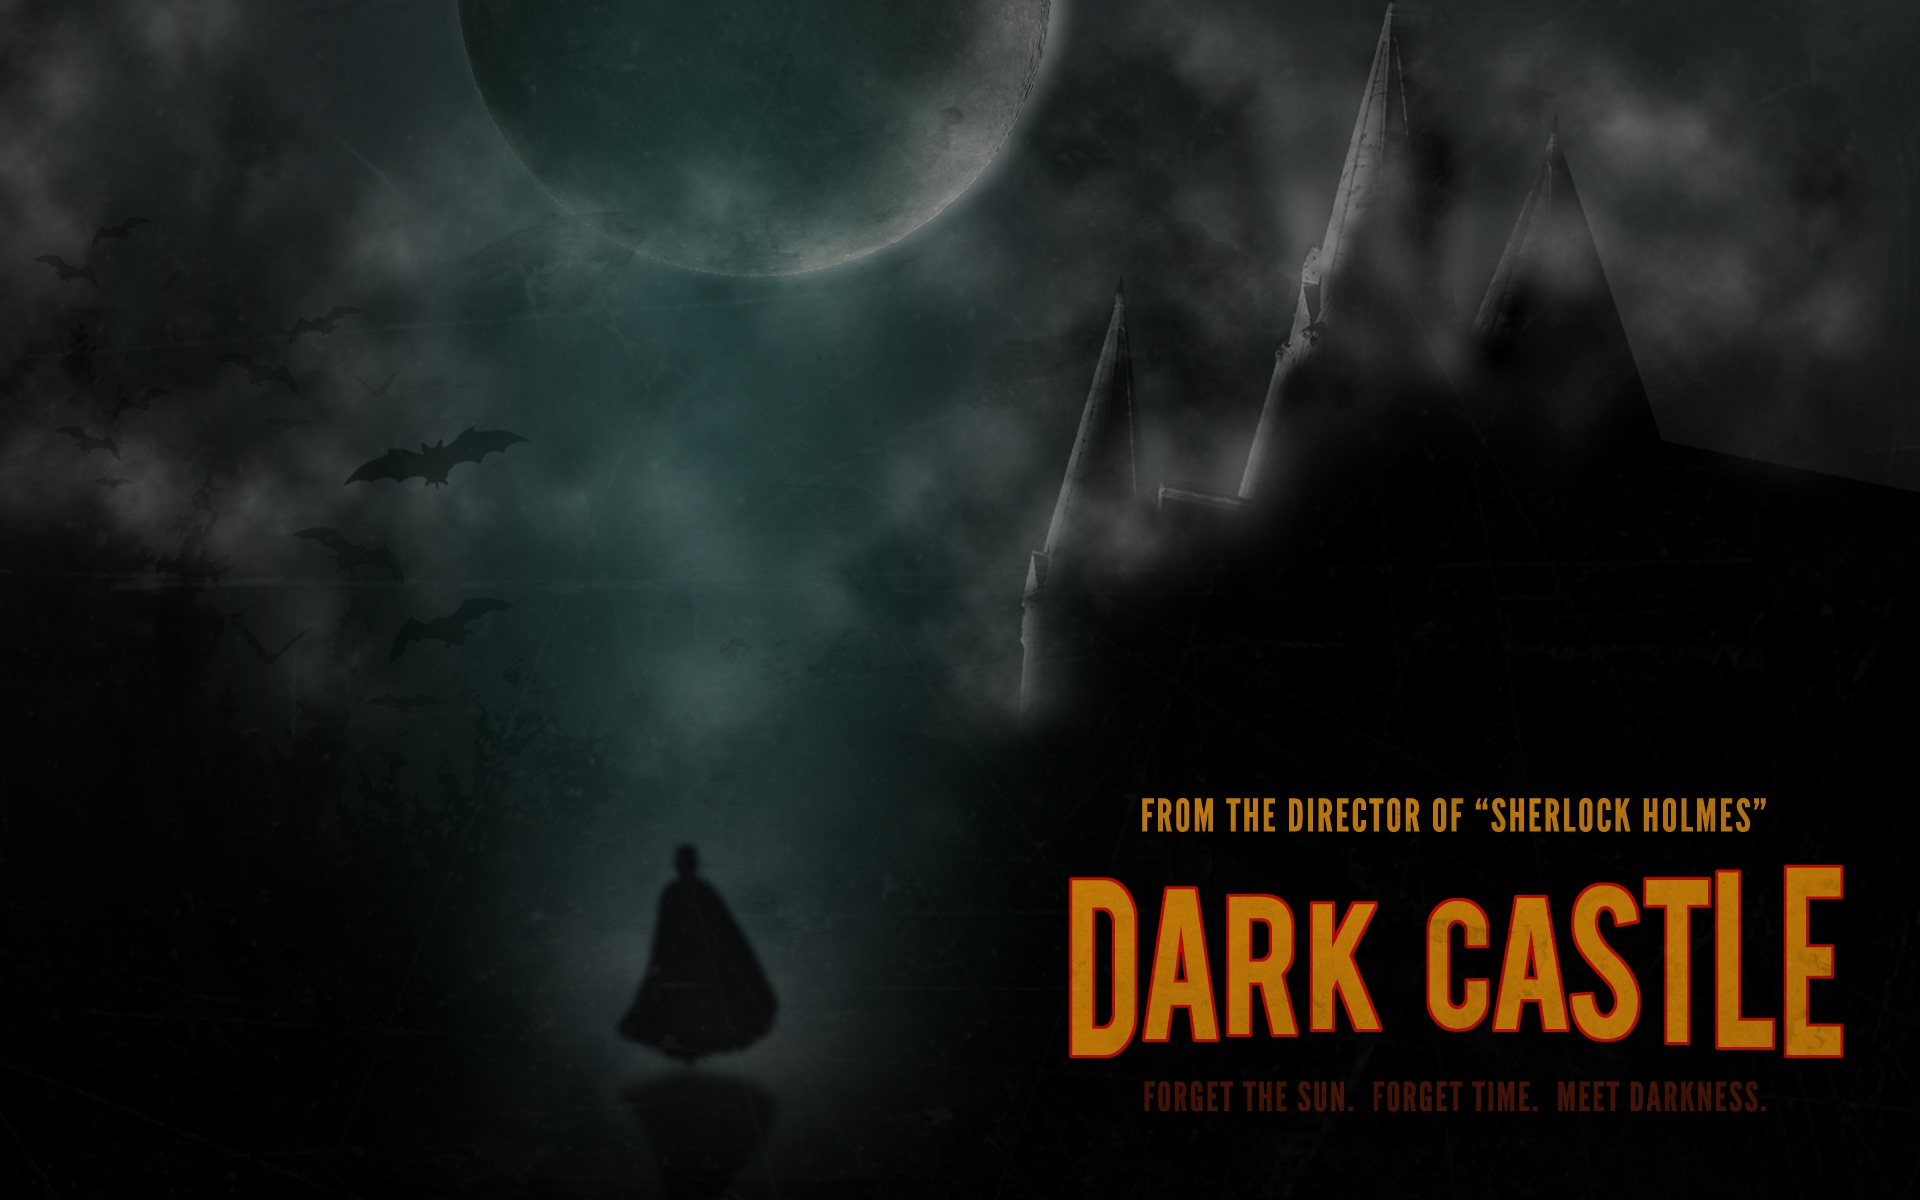 Create a Fun Horror Movie Poster Design in Photoshop